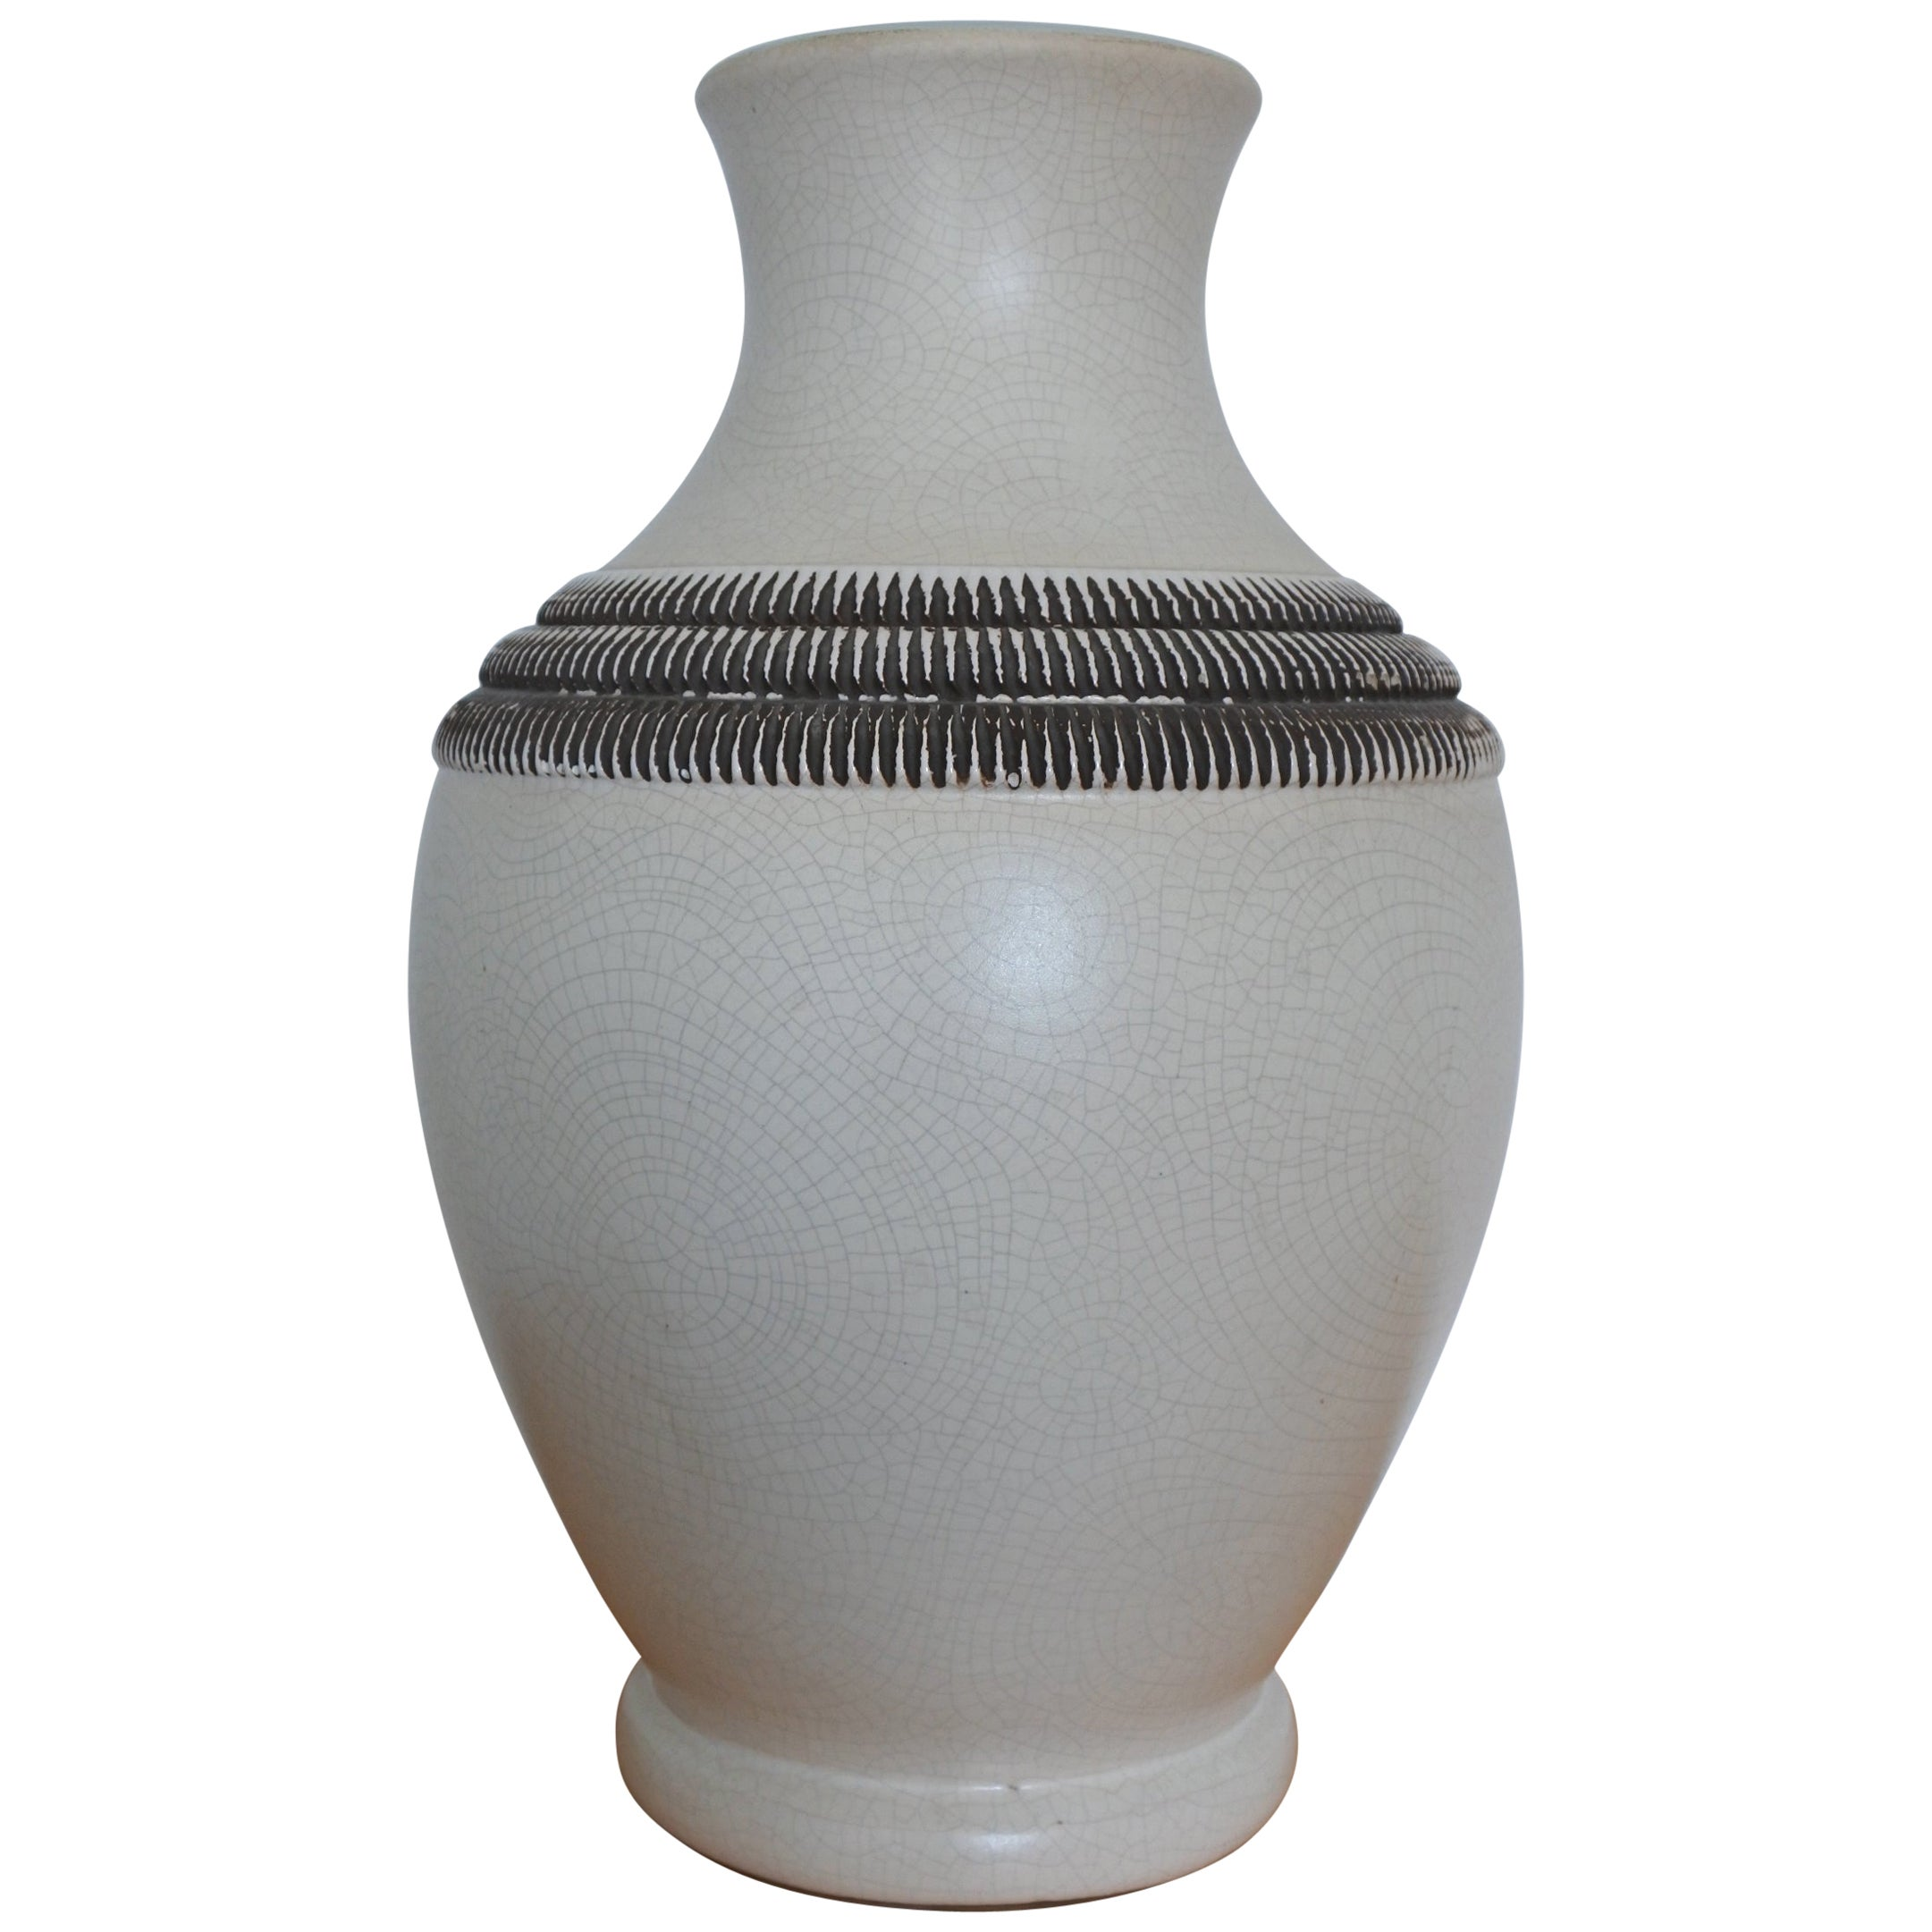 Art Deco French Ceramic Vase by Pol Chambost